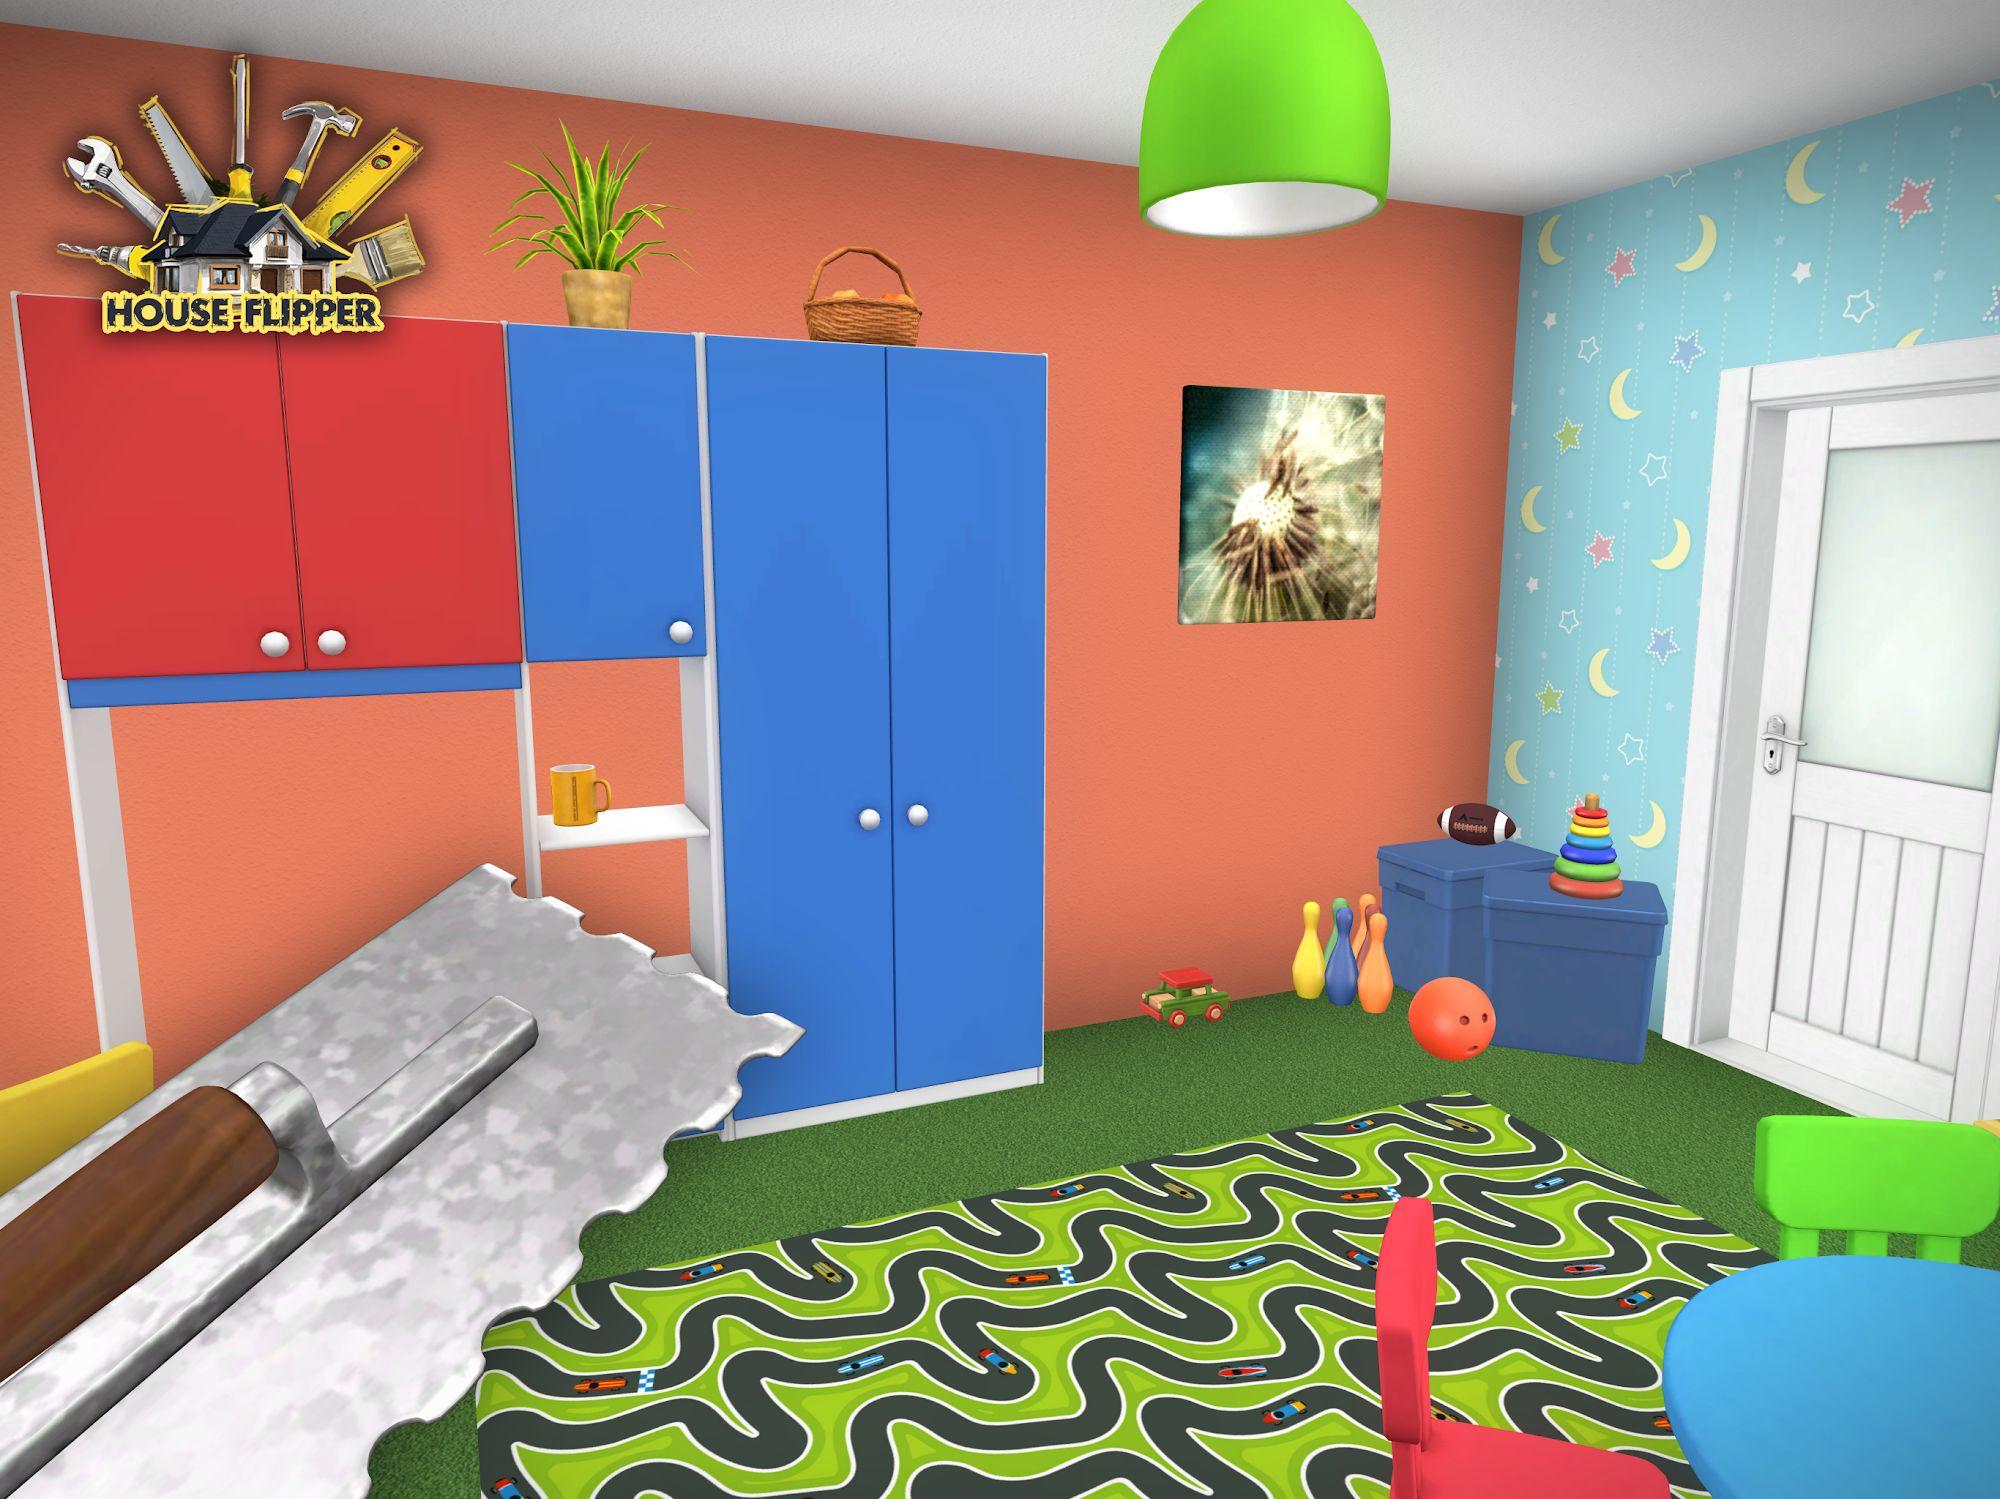 House Flipper: Home Design, Renovation Games capture d'écran 1